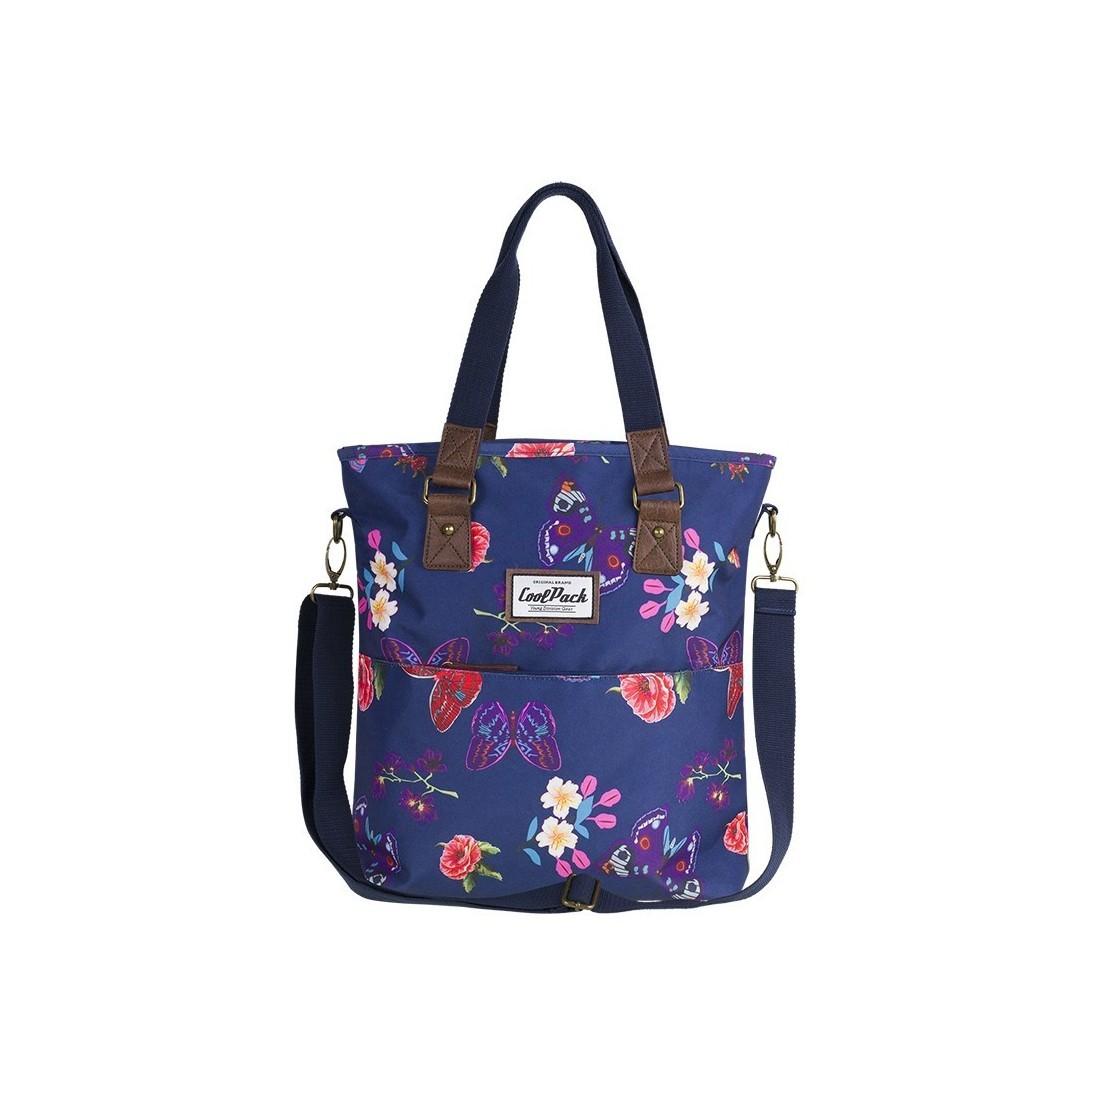 1fb9e3b23a78b Torba damska na ramię CoolPack CP AMBER SUMMER DREAM niebieska w motyle i  kwiaty - A101